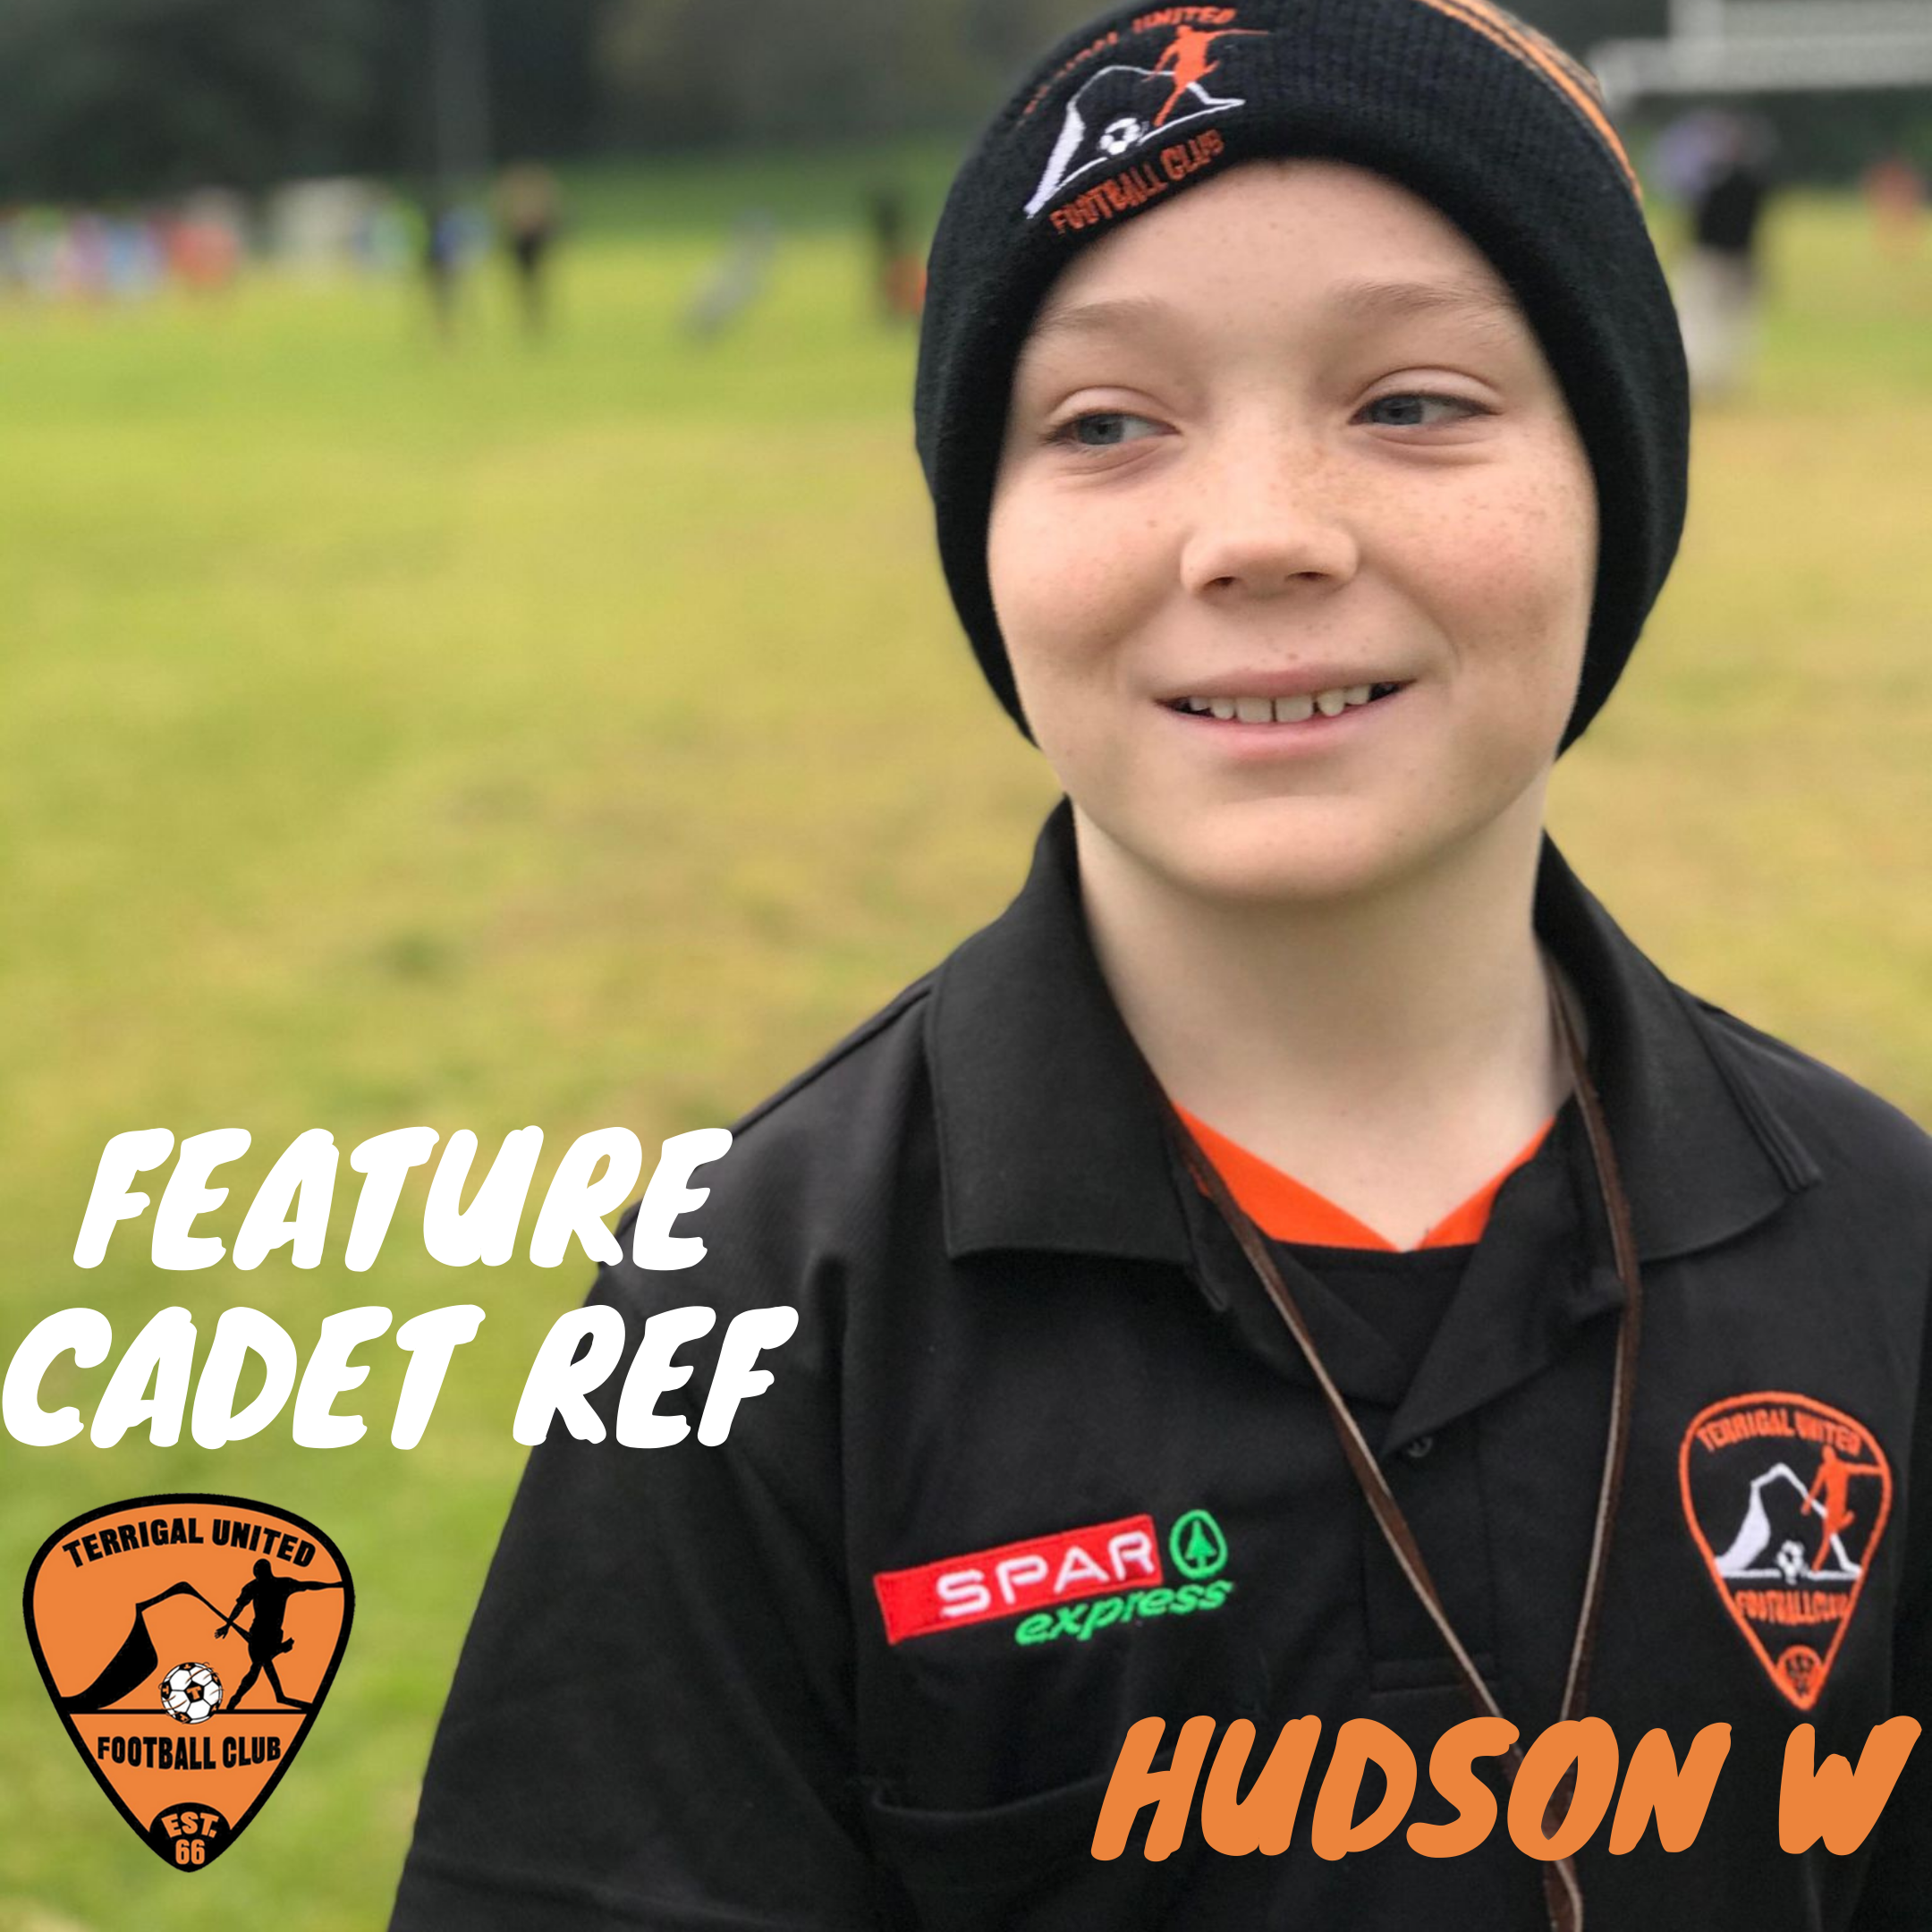 Feature Cadet Ref: Hudson W